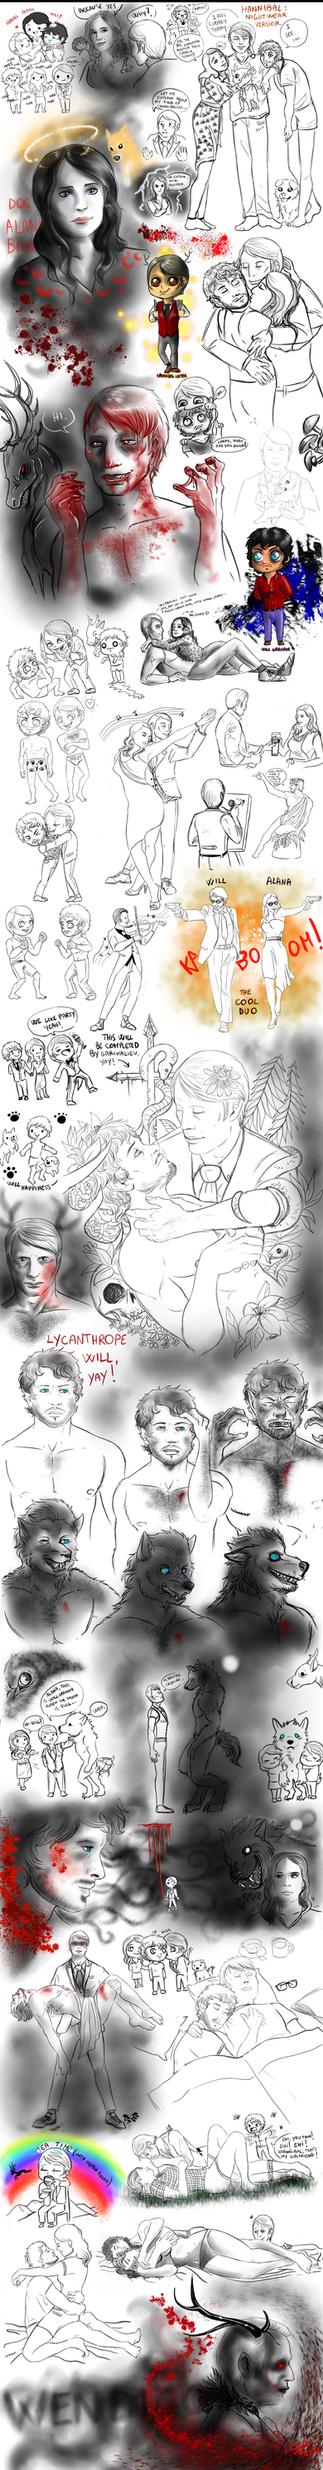 NBC Hannibal sketchdump by FuriarossaAndMimma